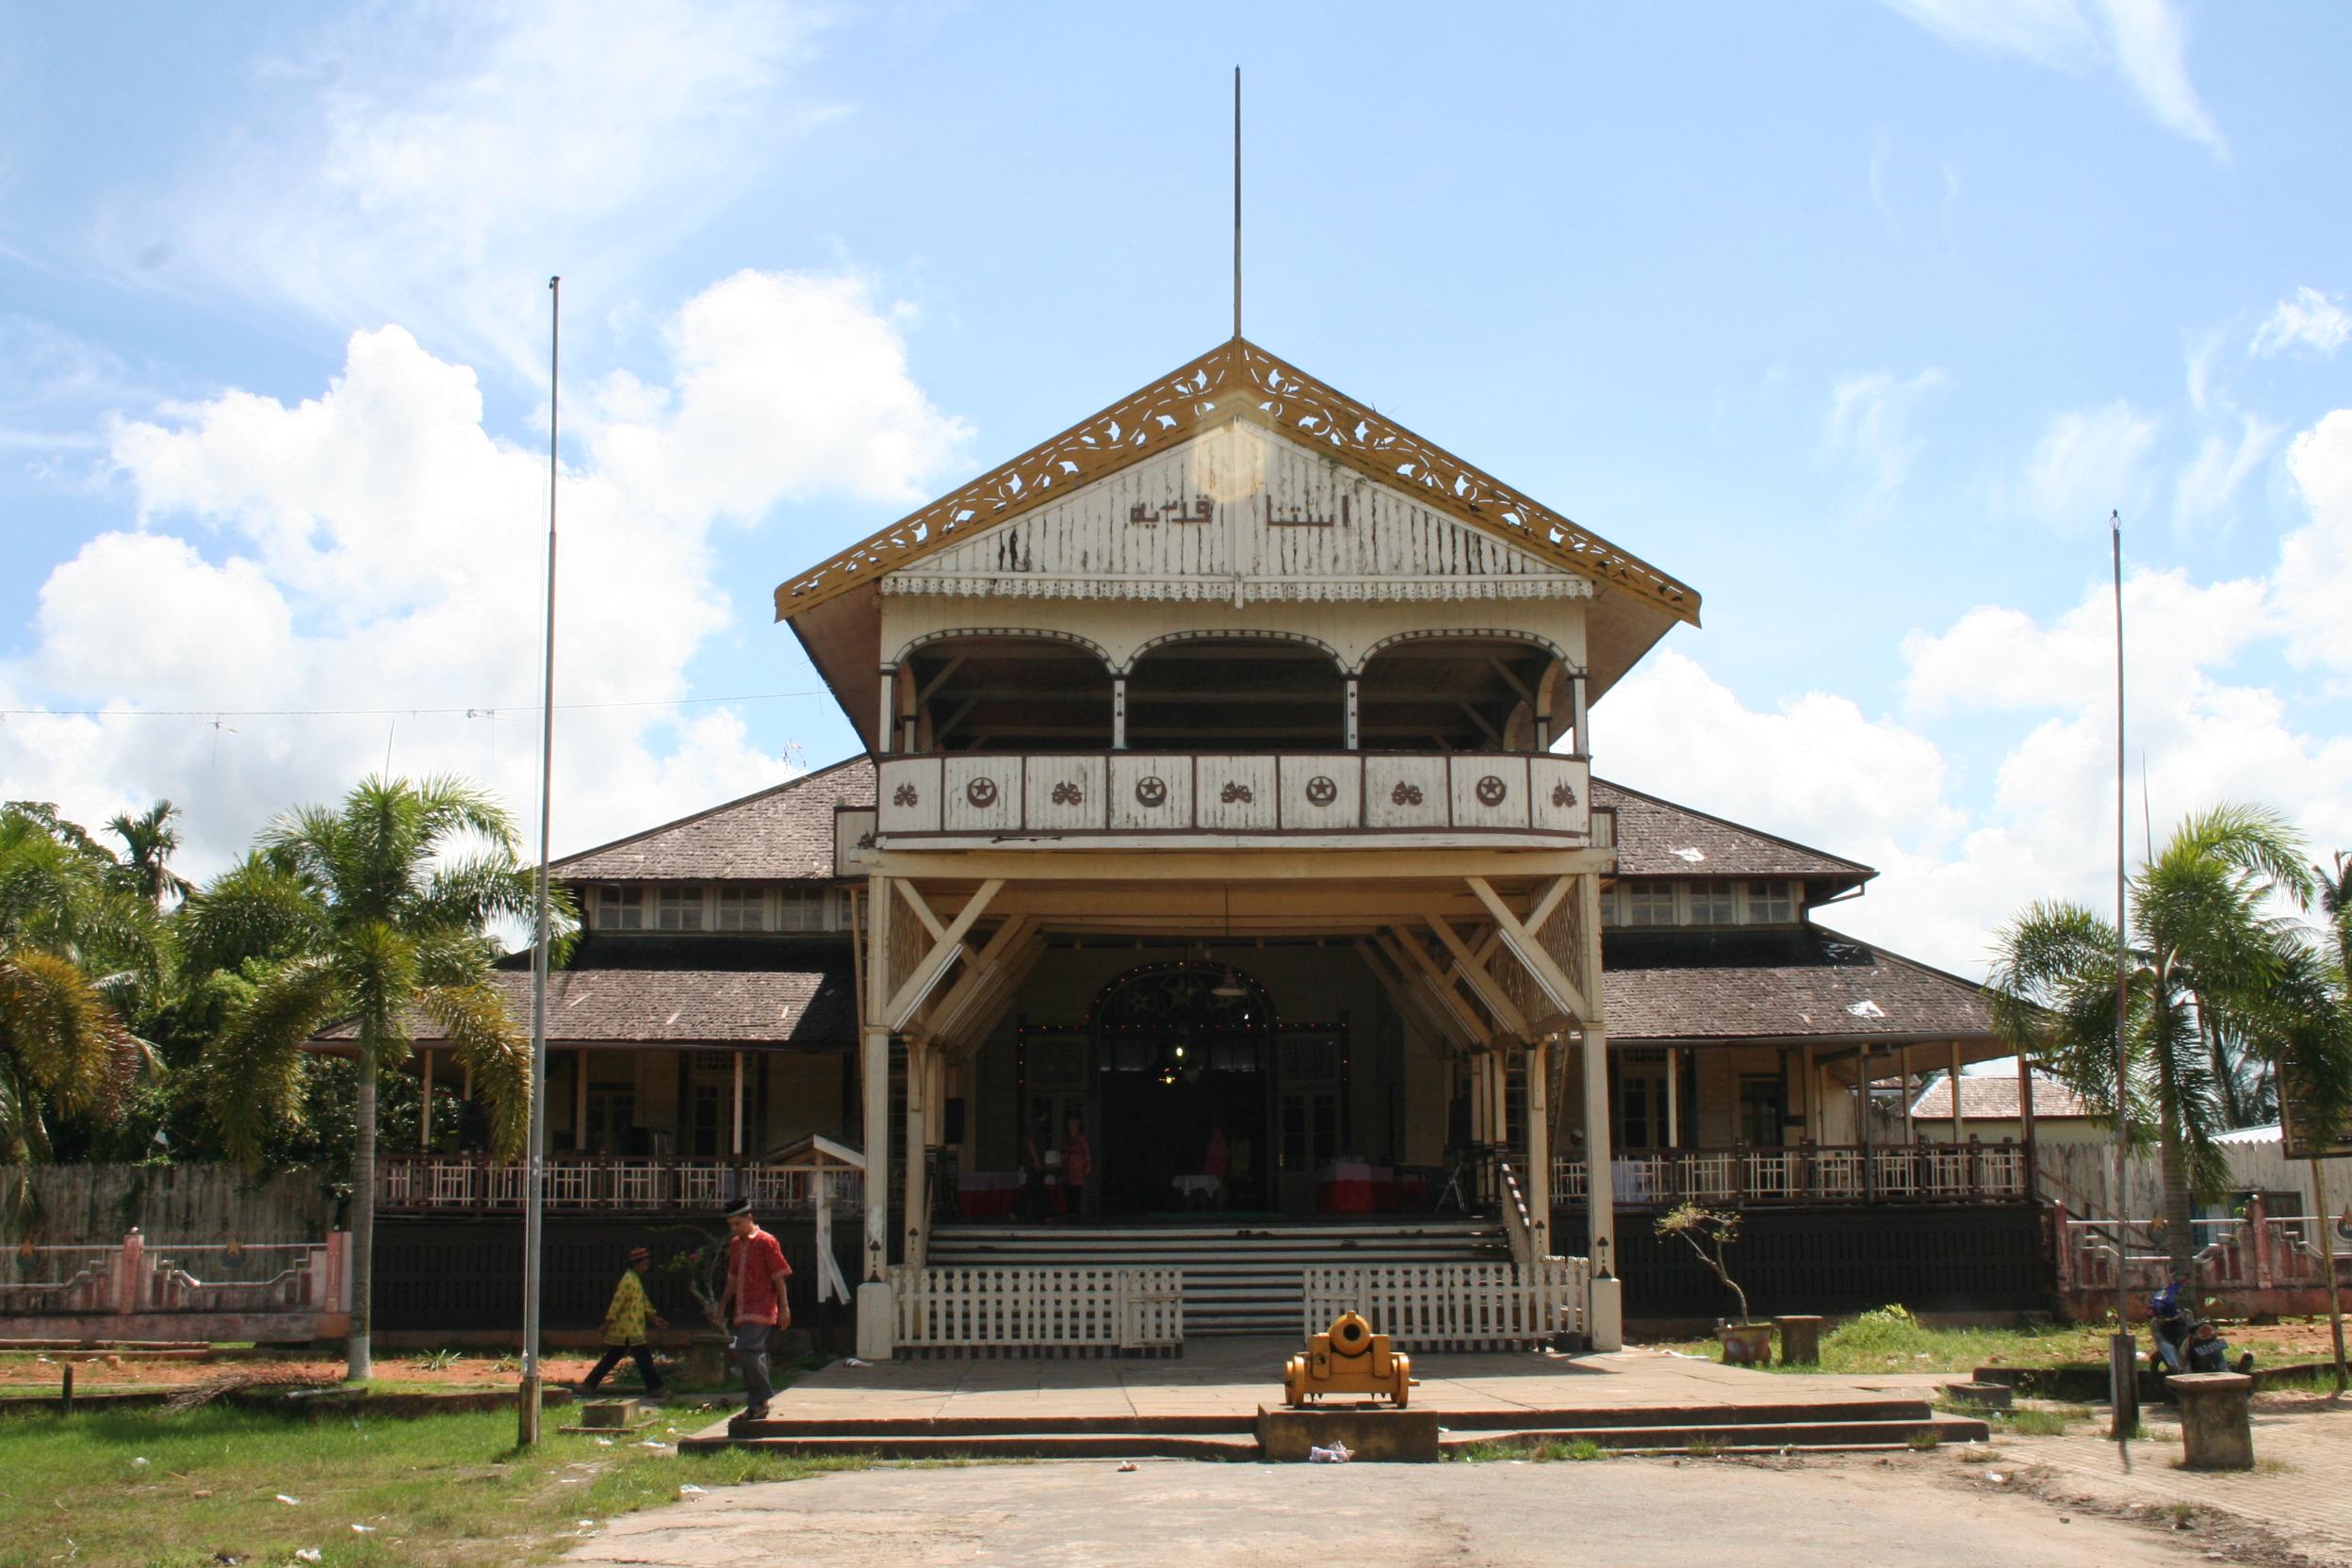 15 Tempat Wisata Kalimantan Barat Aiyepers 2016 2017 Istana Kesultanan